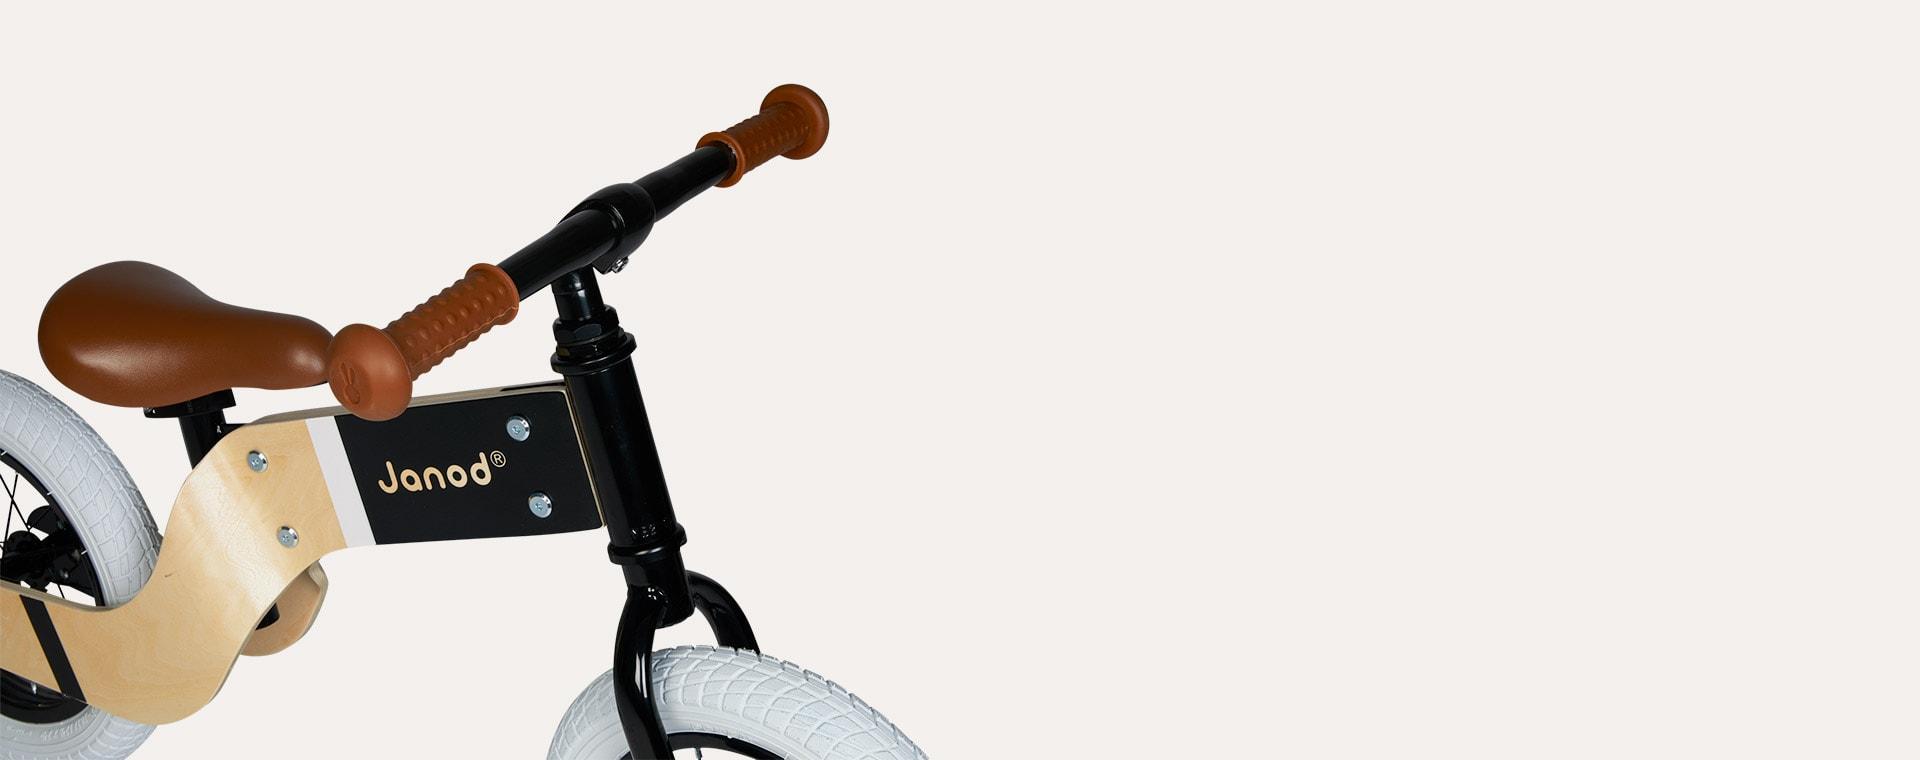 Neutral Janod Deluxe Balance Bike